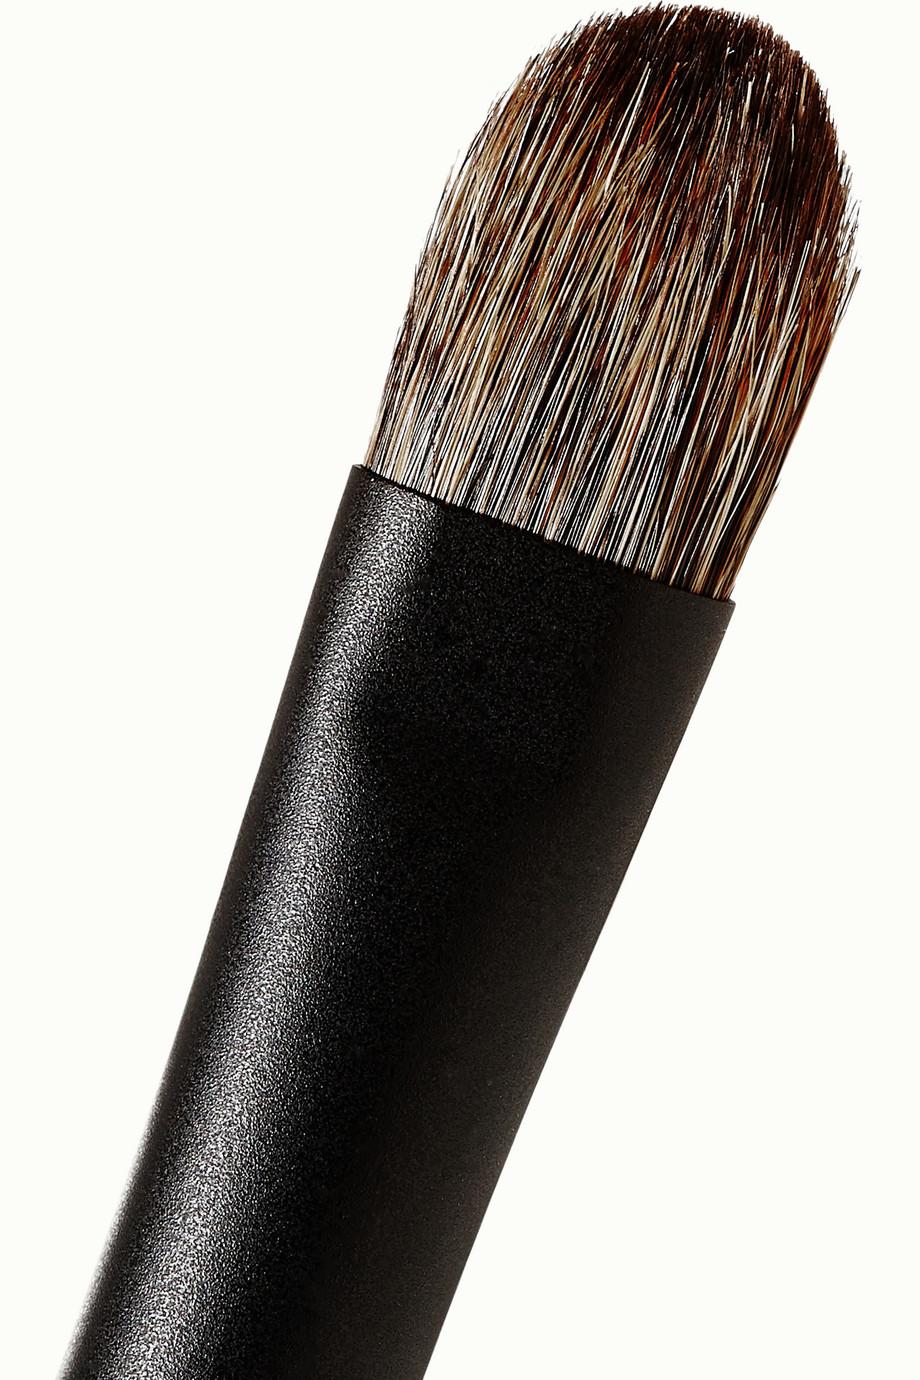 Surratt Beauty Classique Shadow Brush Moyenne